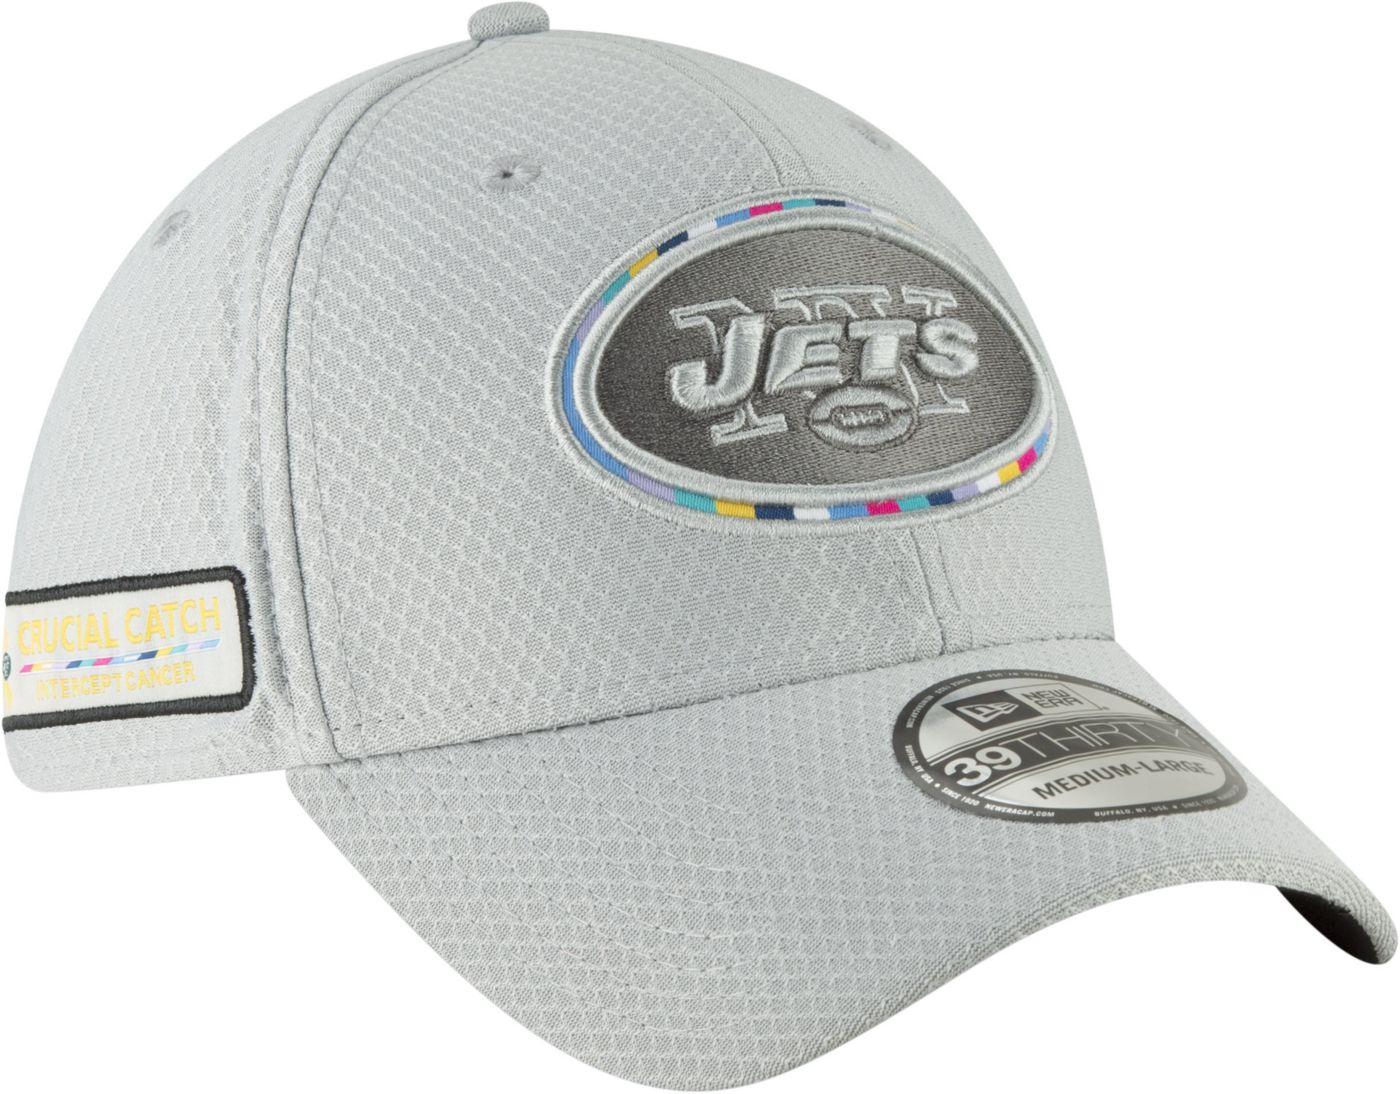 New Era Men's Crucial Catch New York Jets Sideline 39Thirty White Stretch Fit Hat